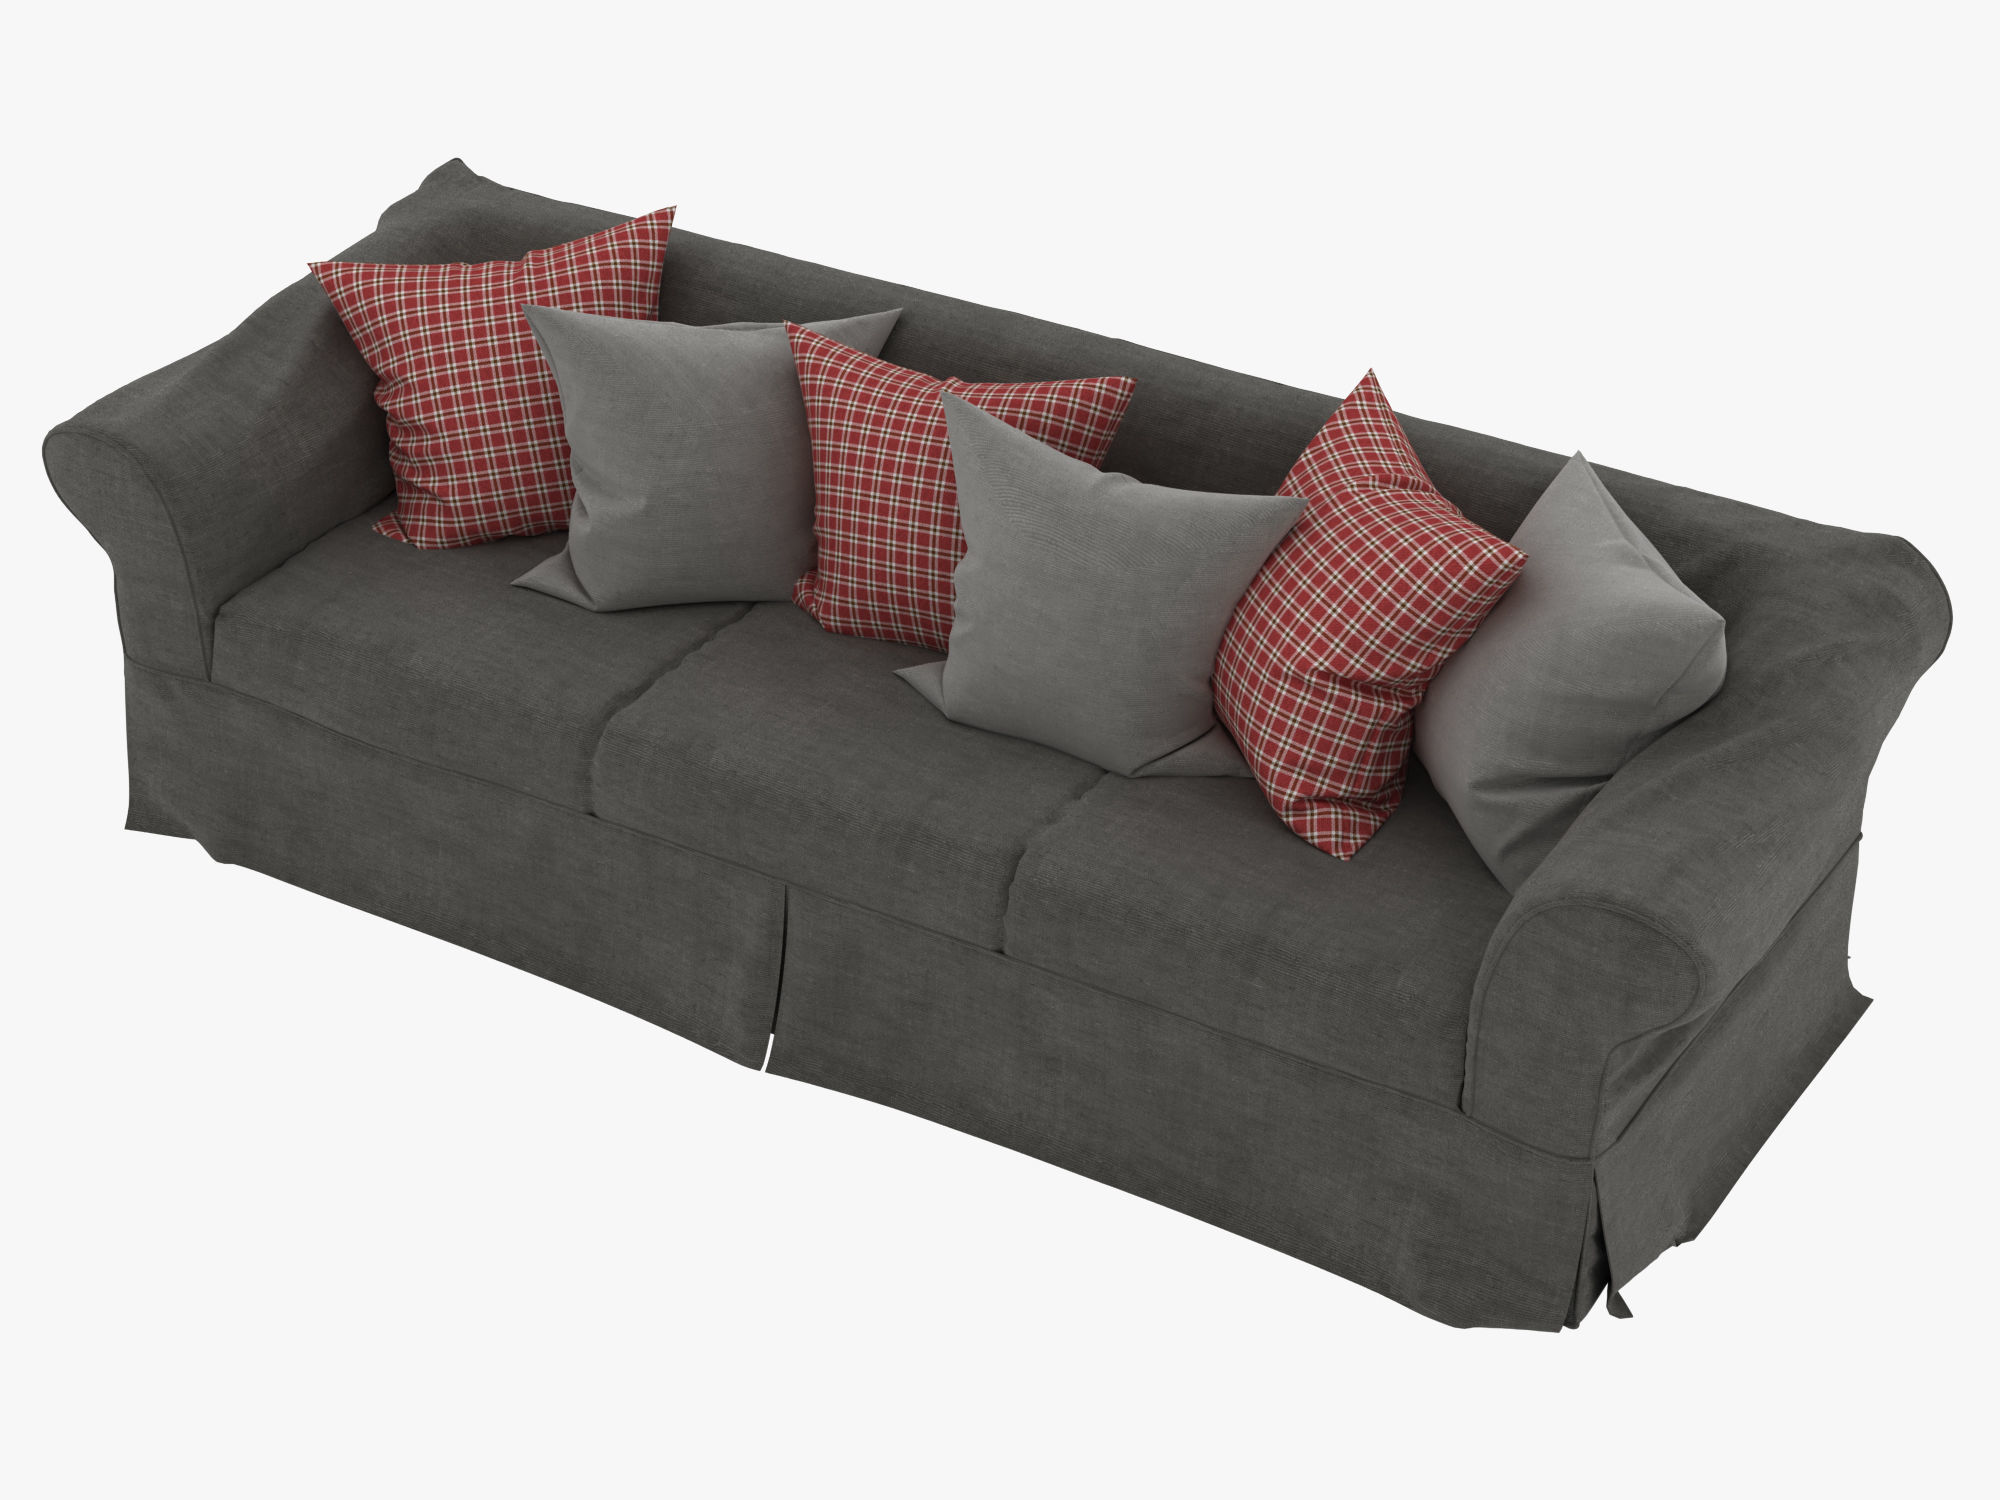 Sofa 4-Seater